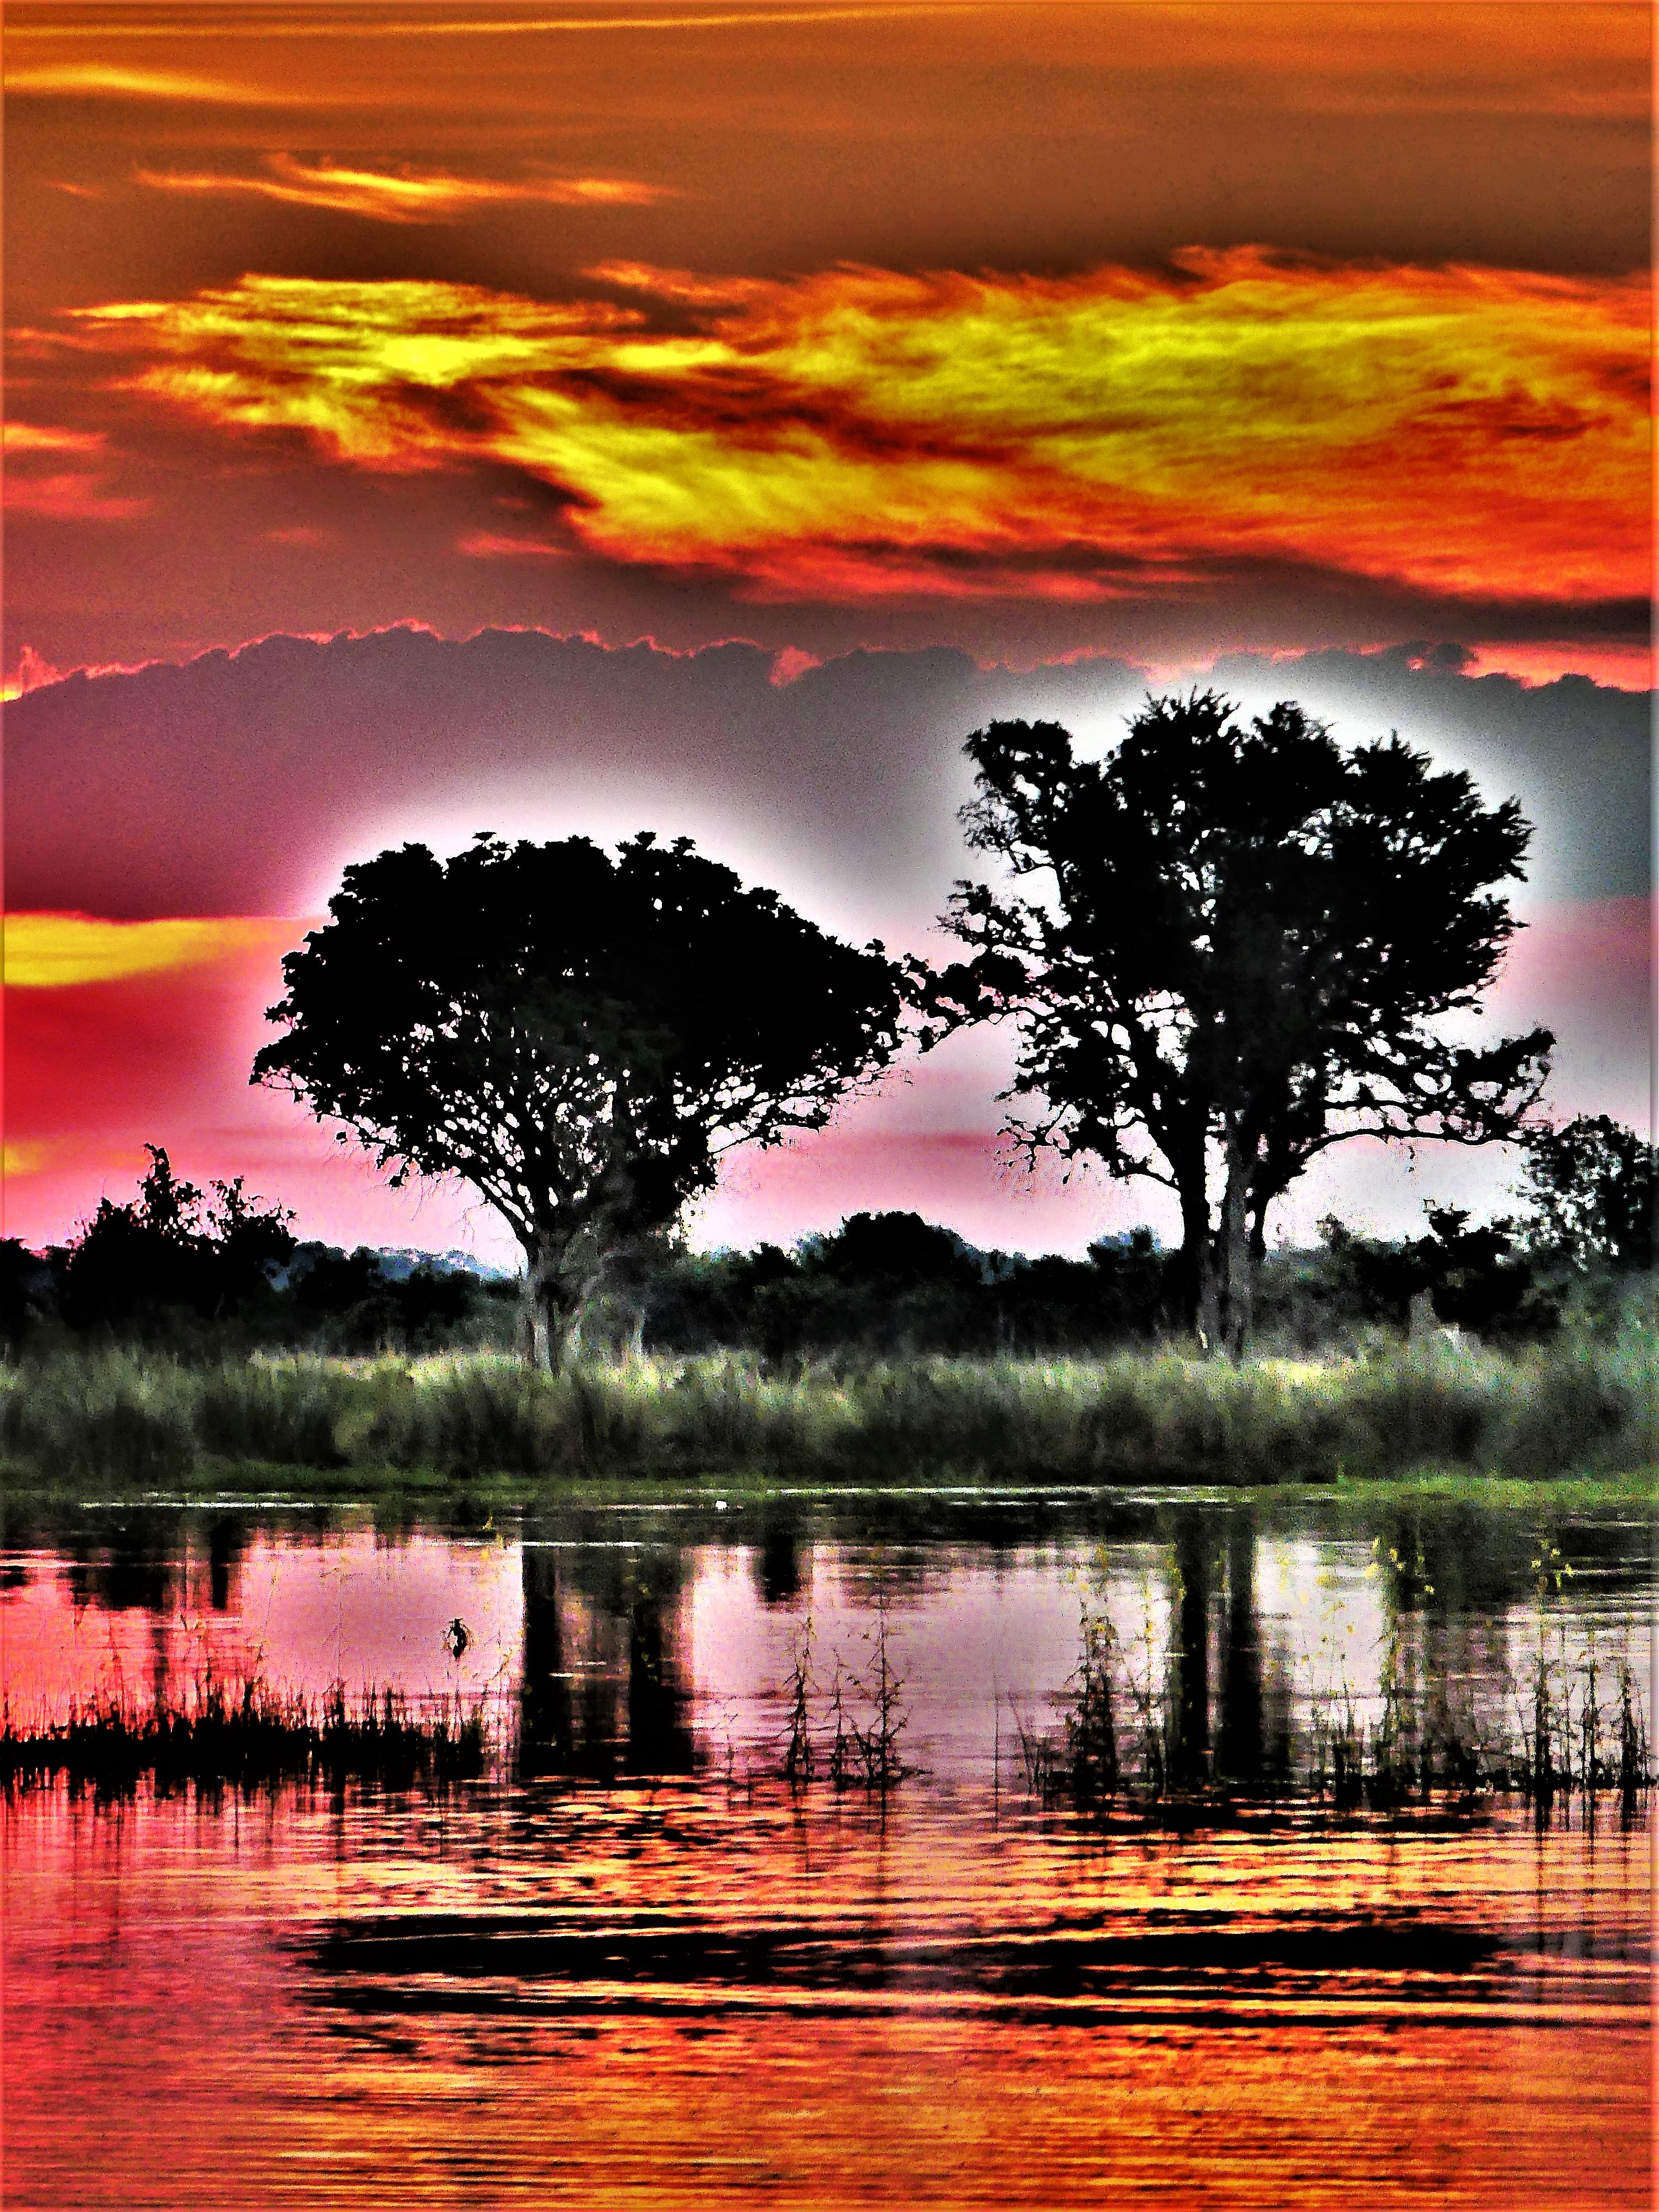 hippo pond sunset.1jpg (2)